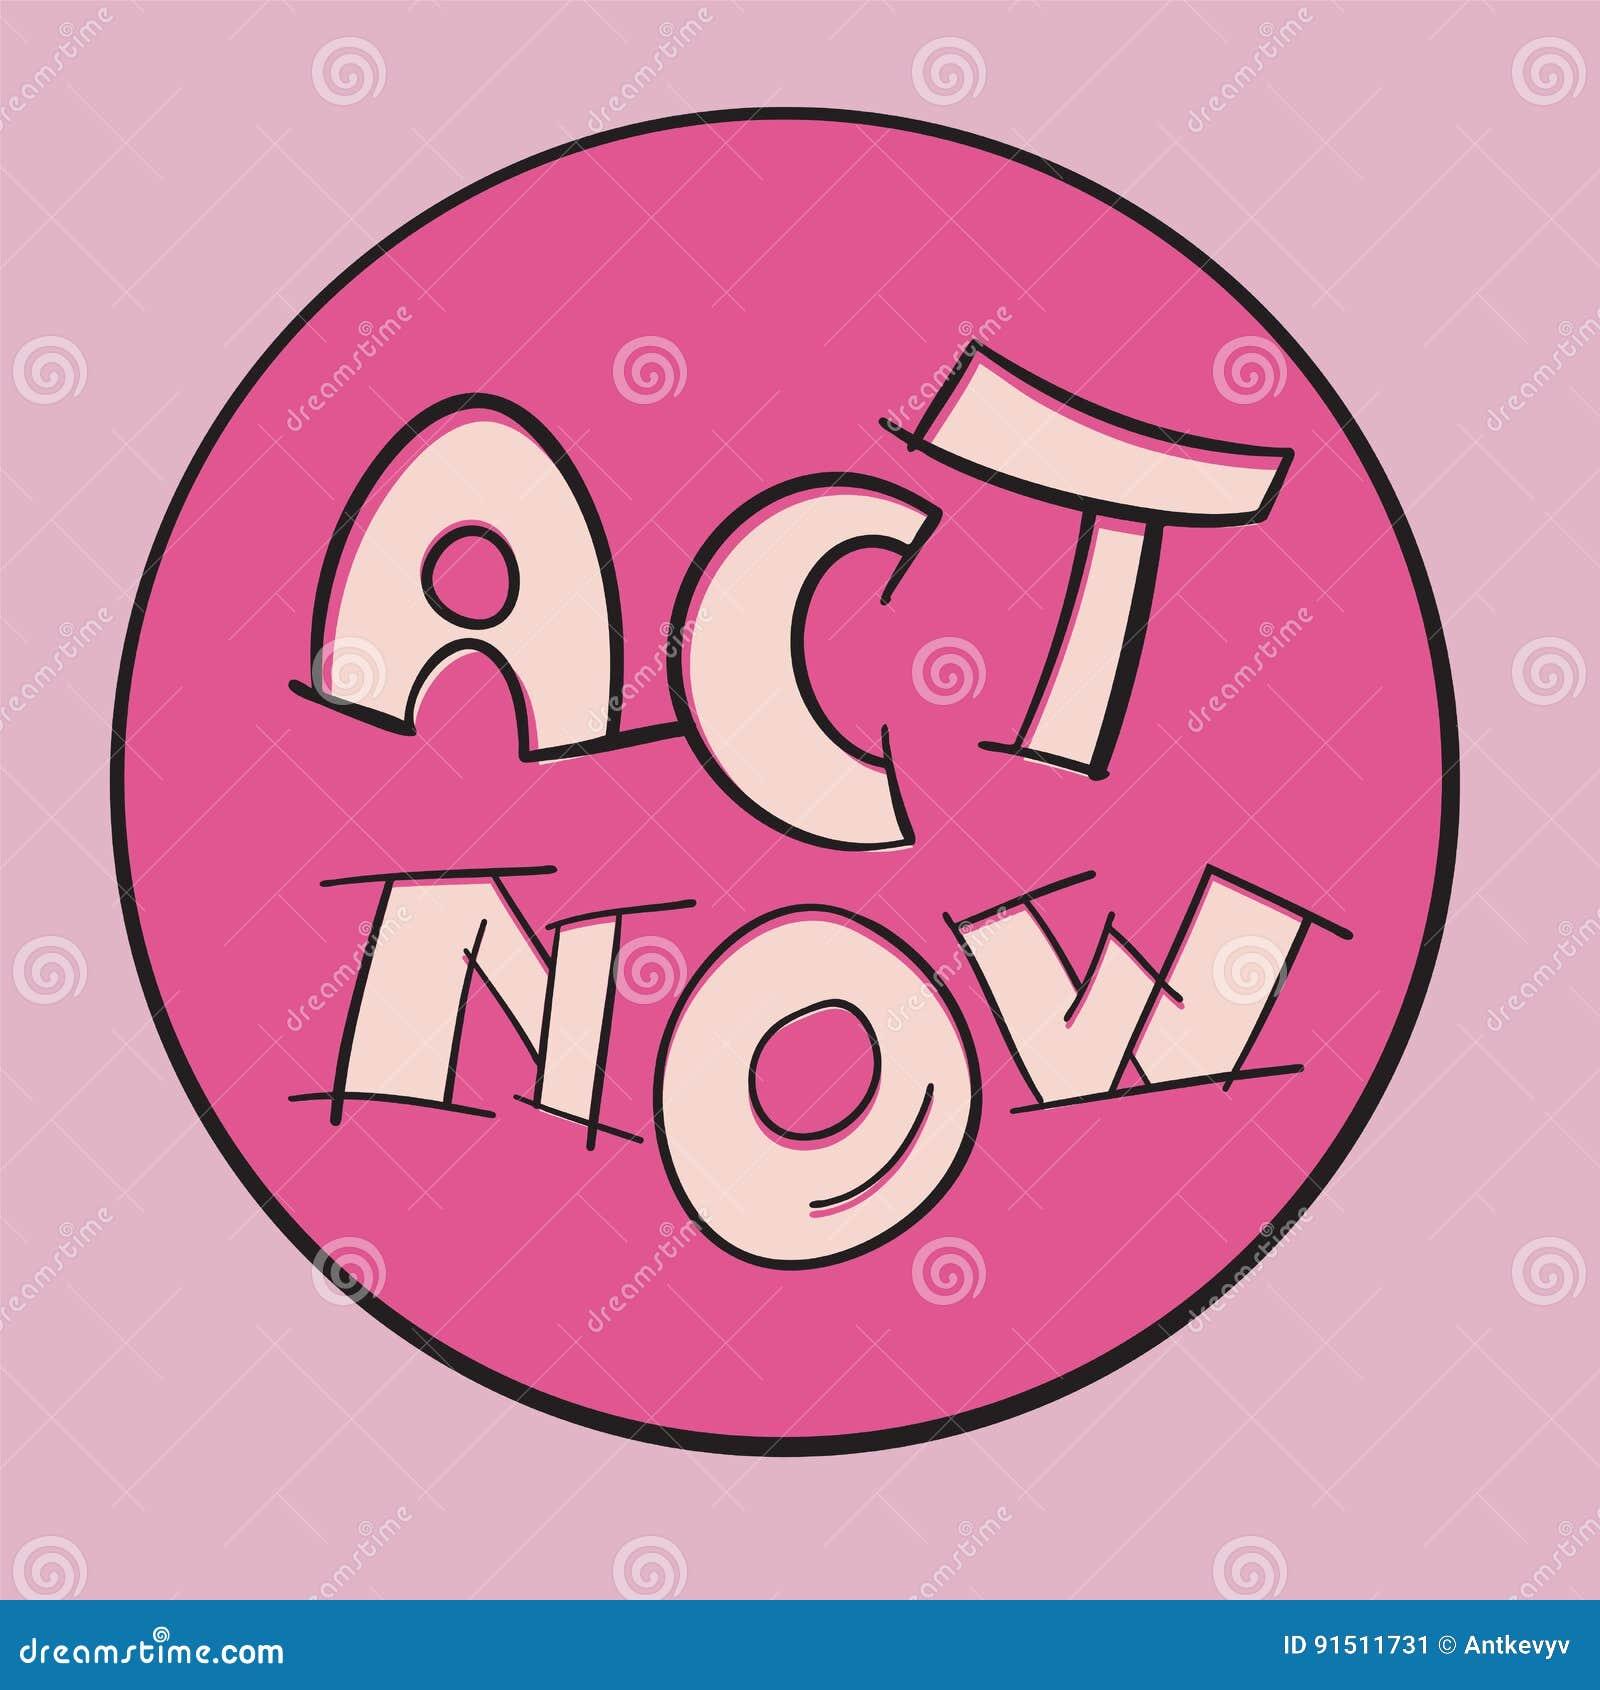 Act now badge change vector